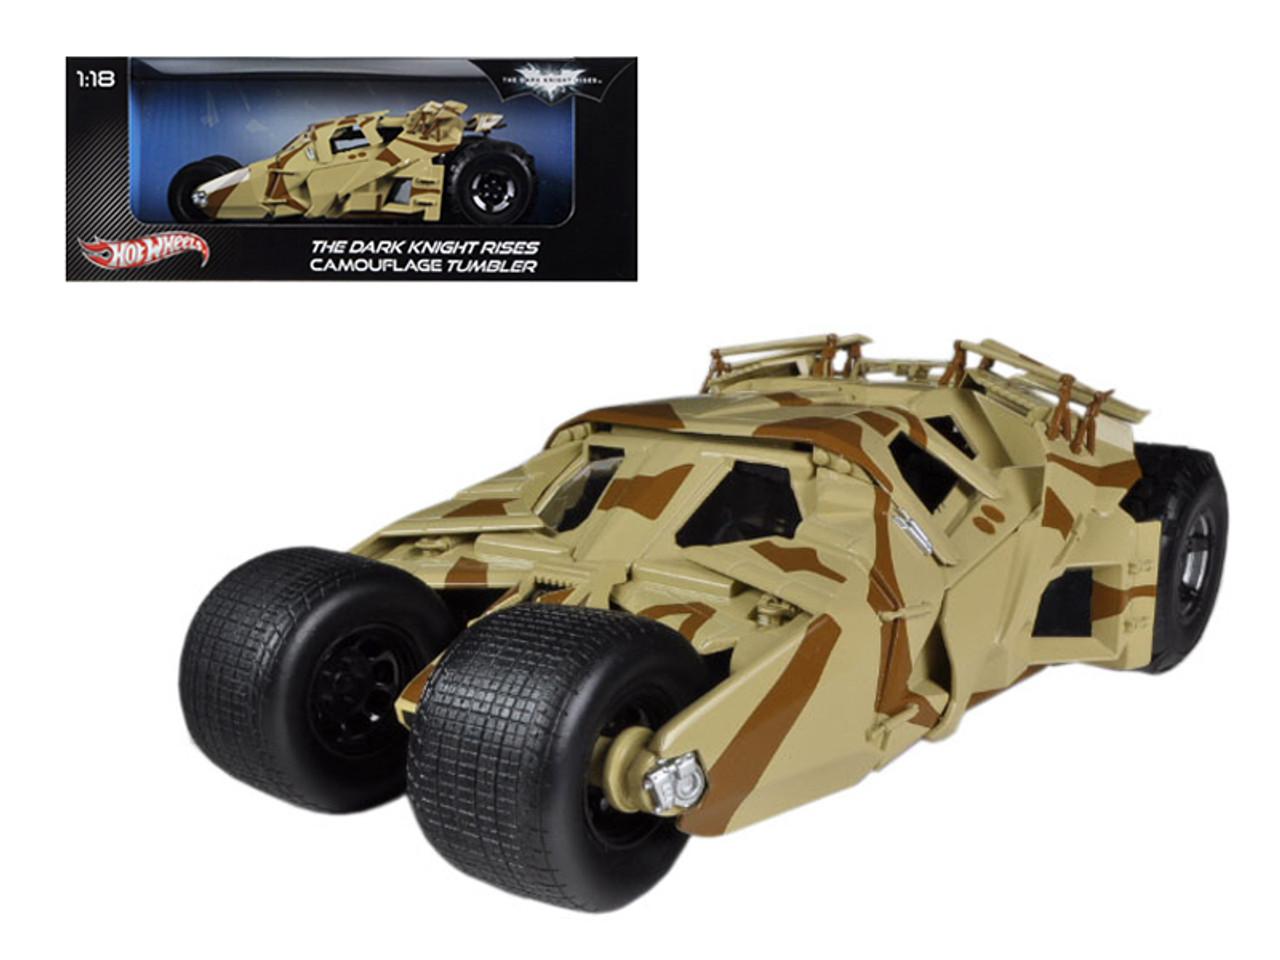 "1/18 Hot Wheels Hotwheels ""The Dark Knight Rises"" Batmobile Tumbler Camouflage Diecast Car Model"